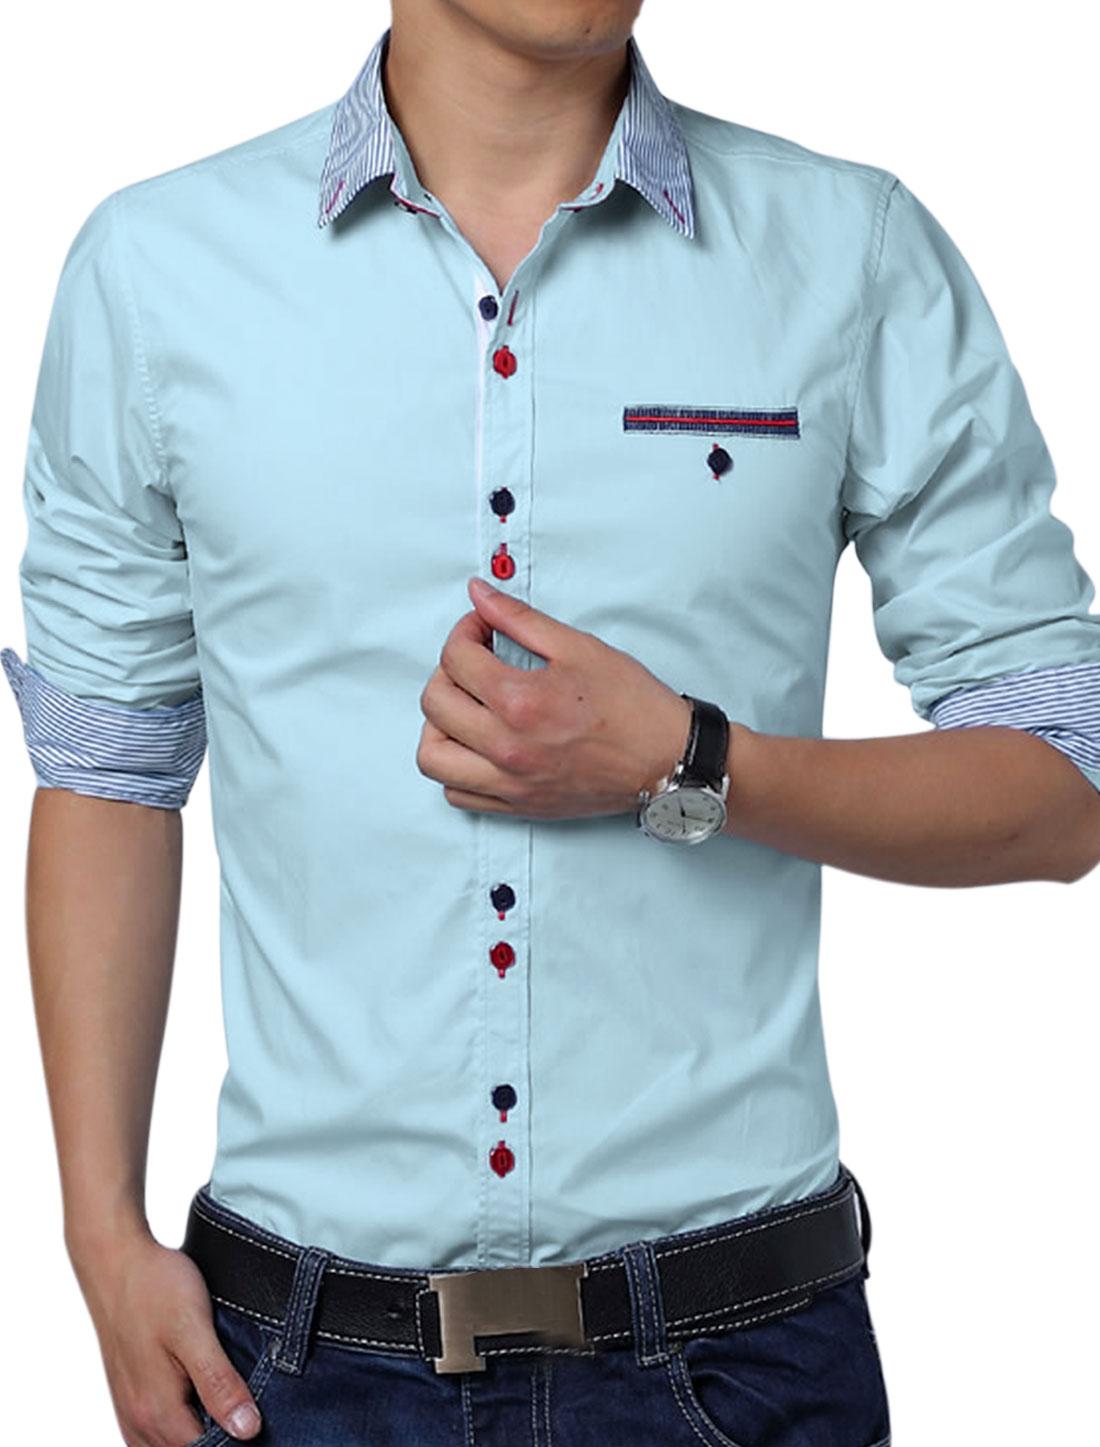 Men Round Hem Panel Design NEW Trendy Top Shirt Baby Blue L